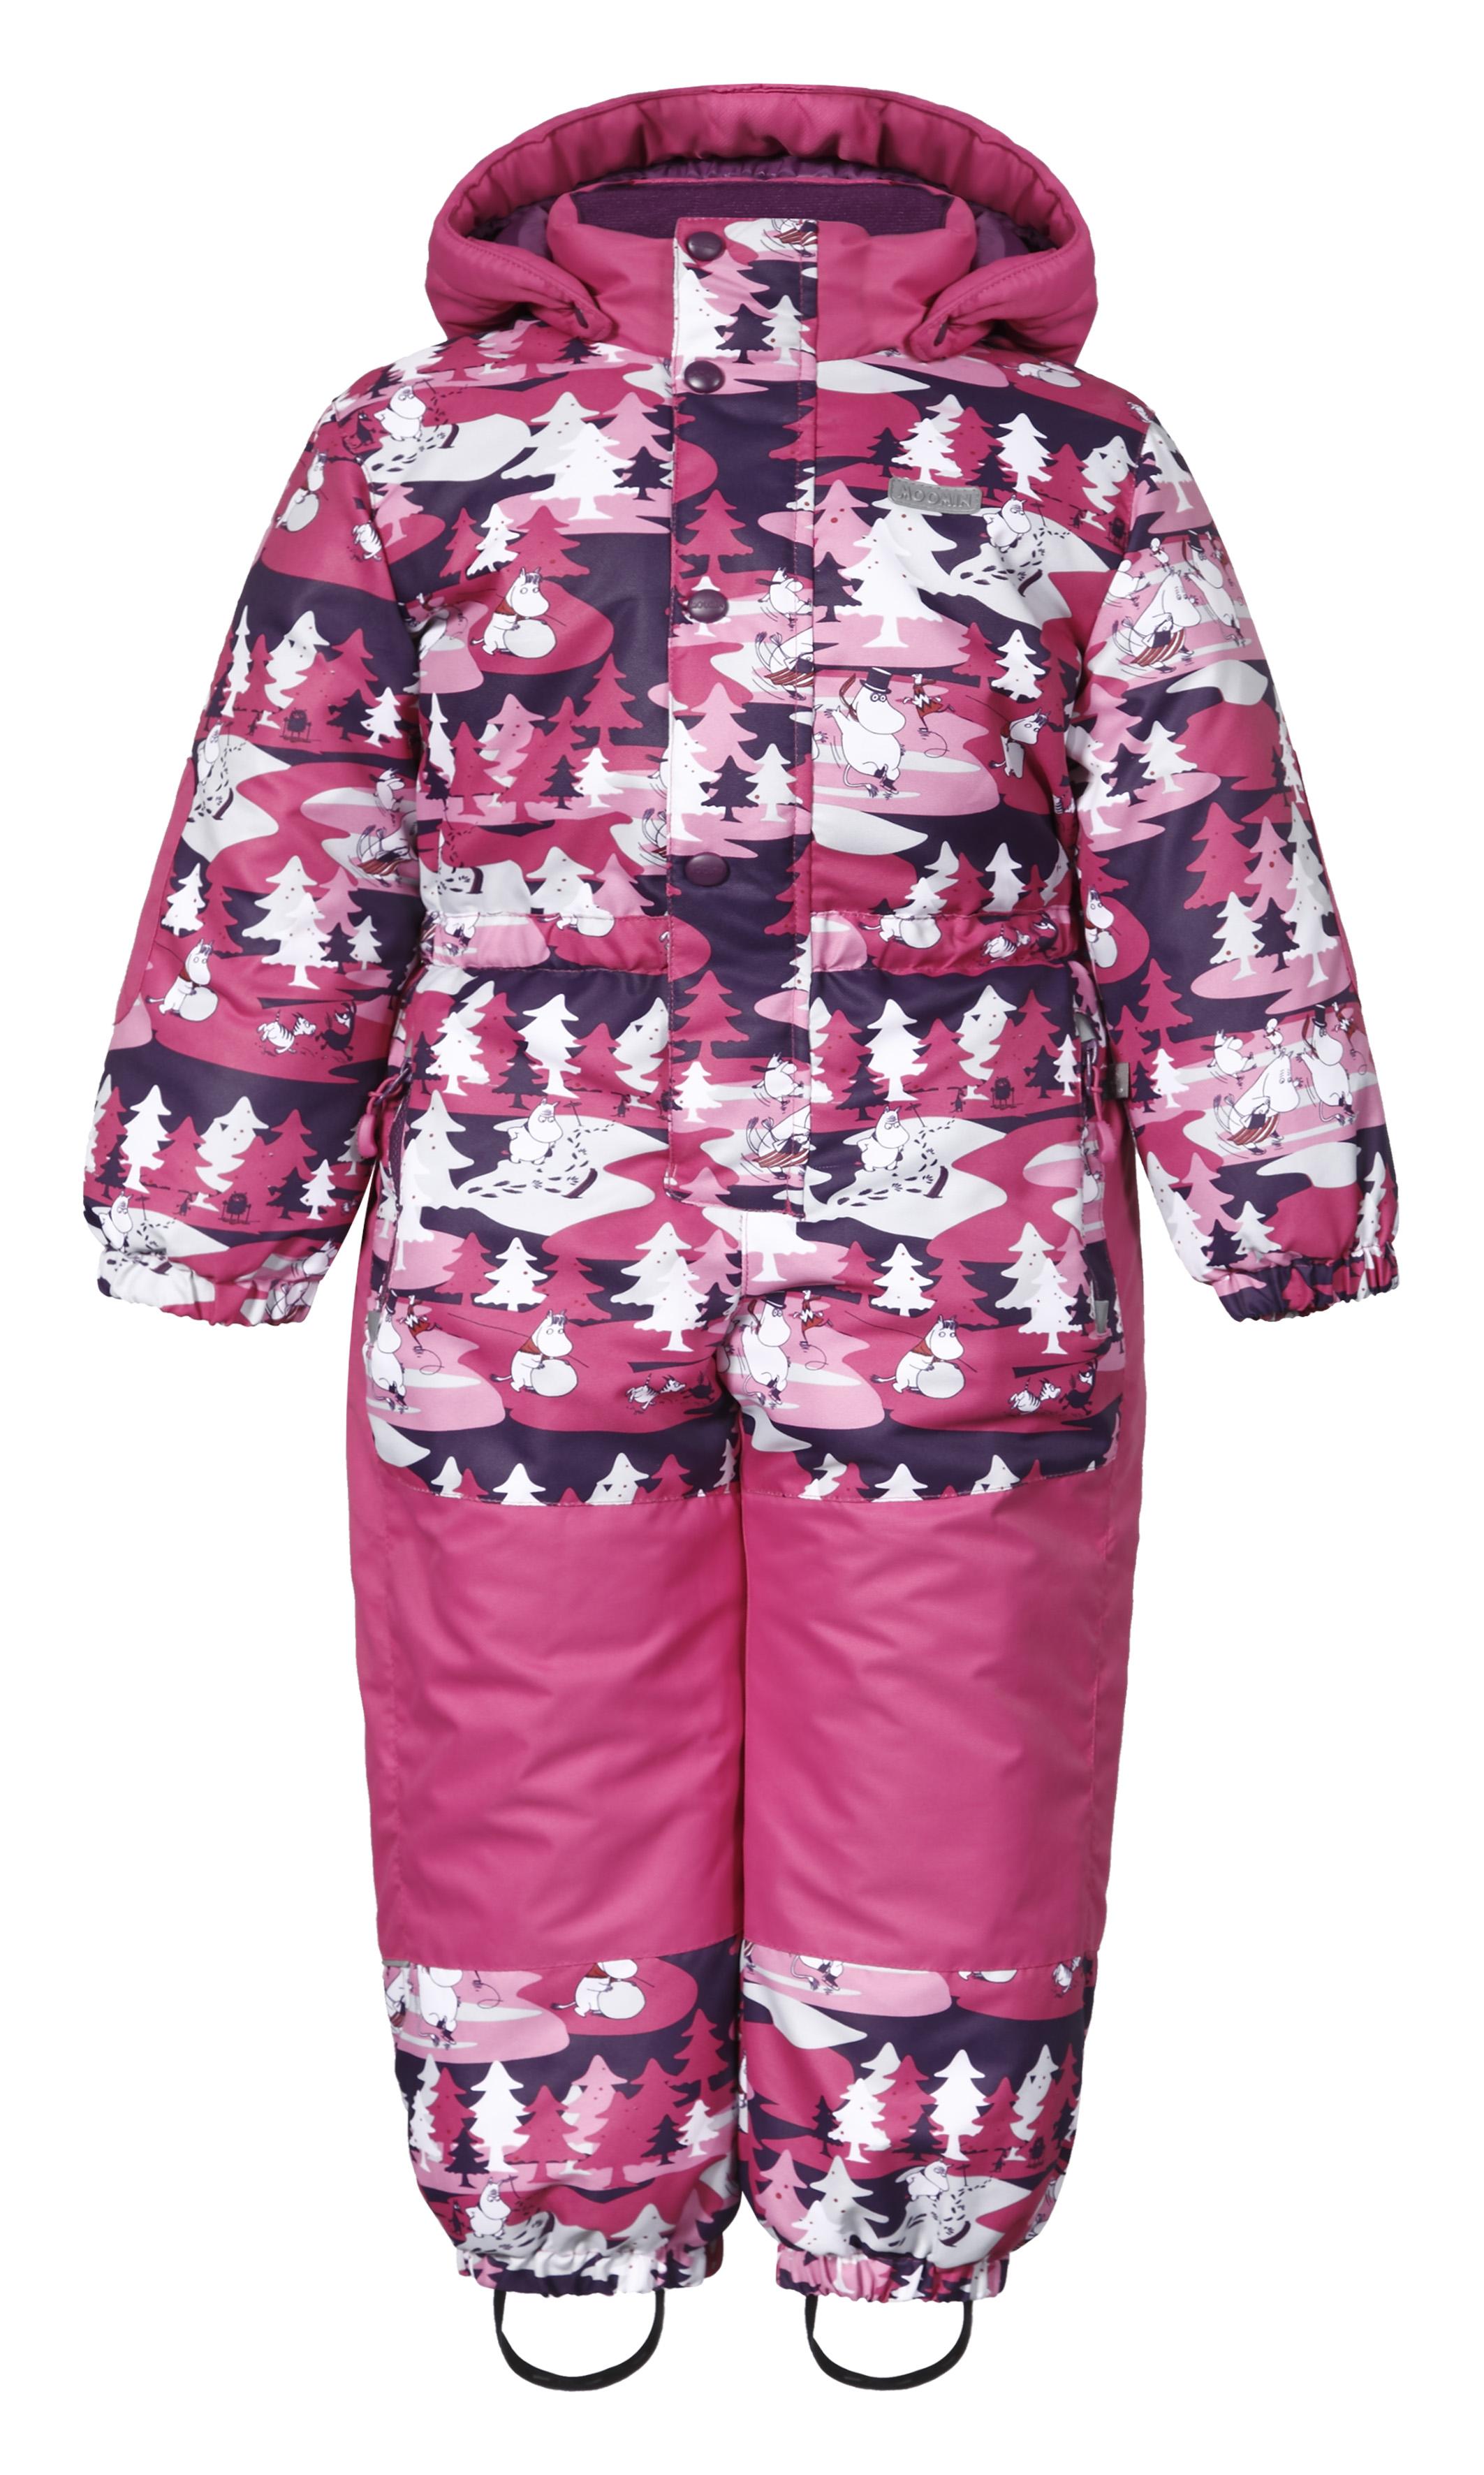 L-Fashion Group Oy - Girls padded set